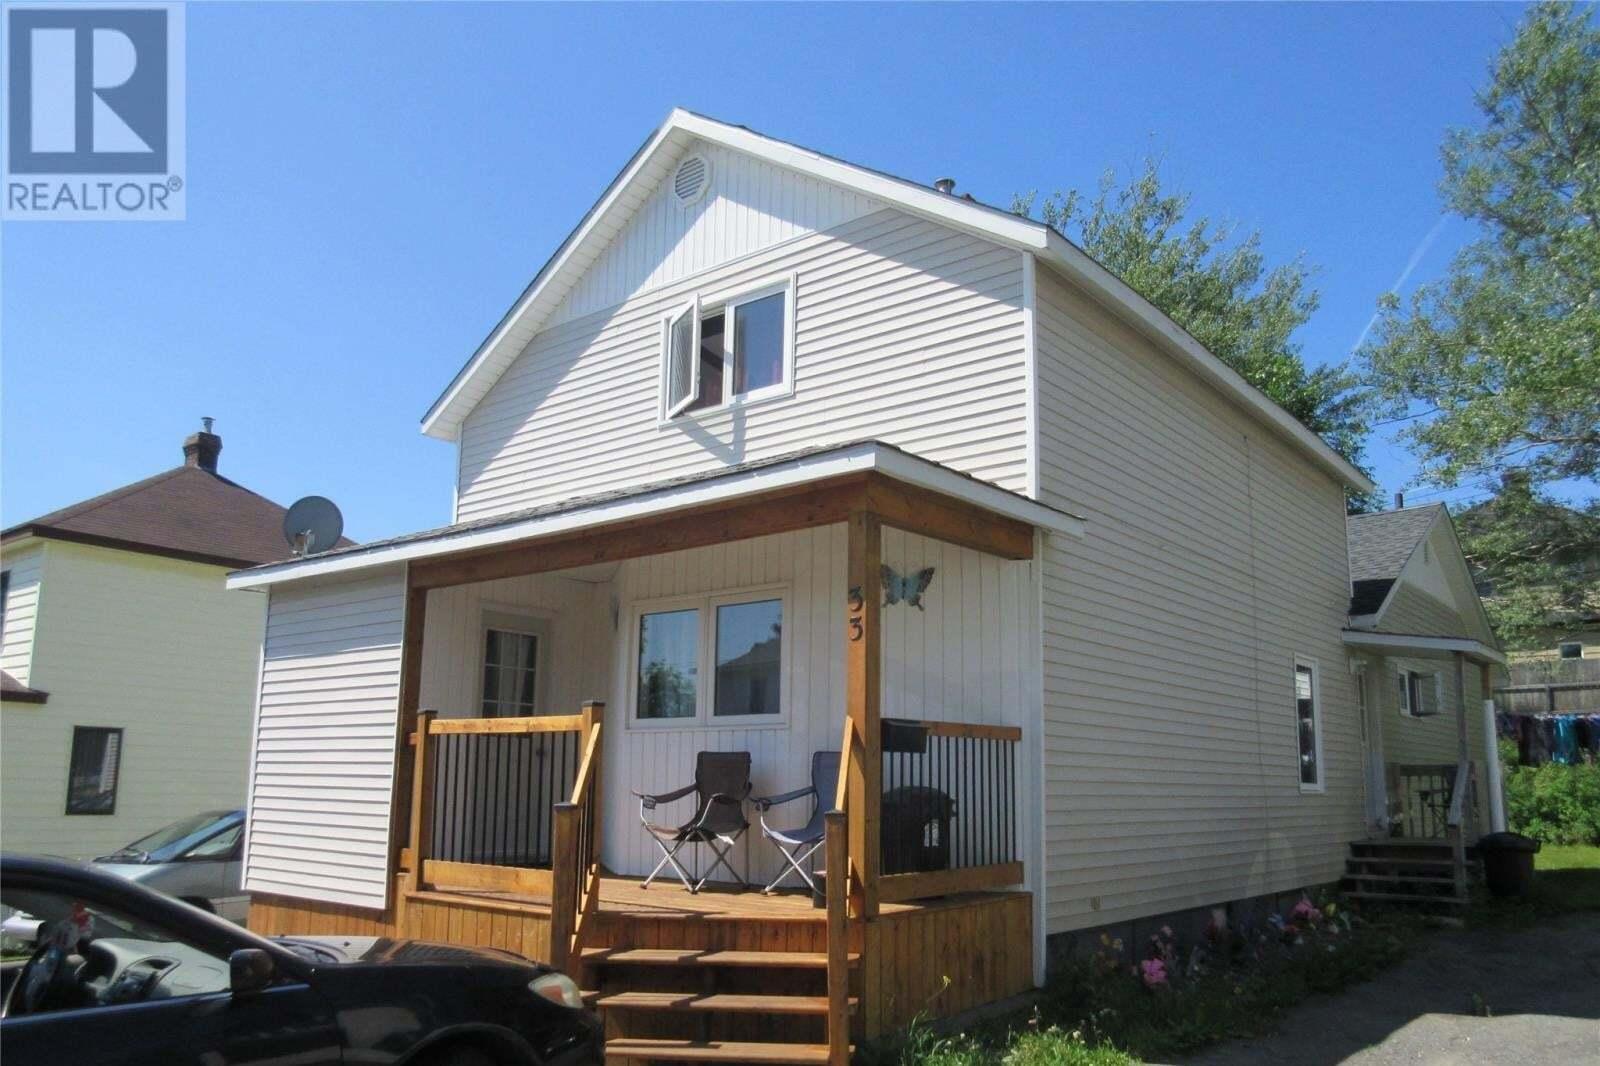 House for sale at 33 Junction Rd Grand Falls-windsor Newfoundland - MLS: 1216945